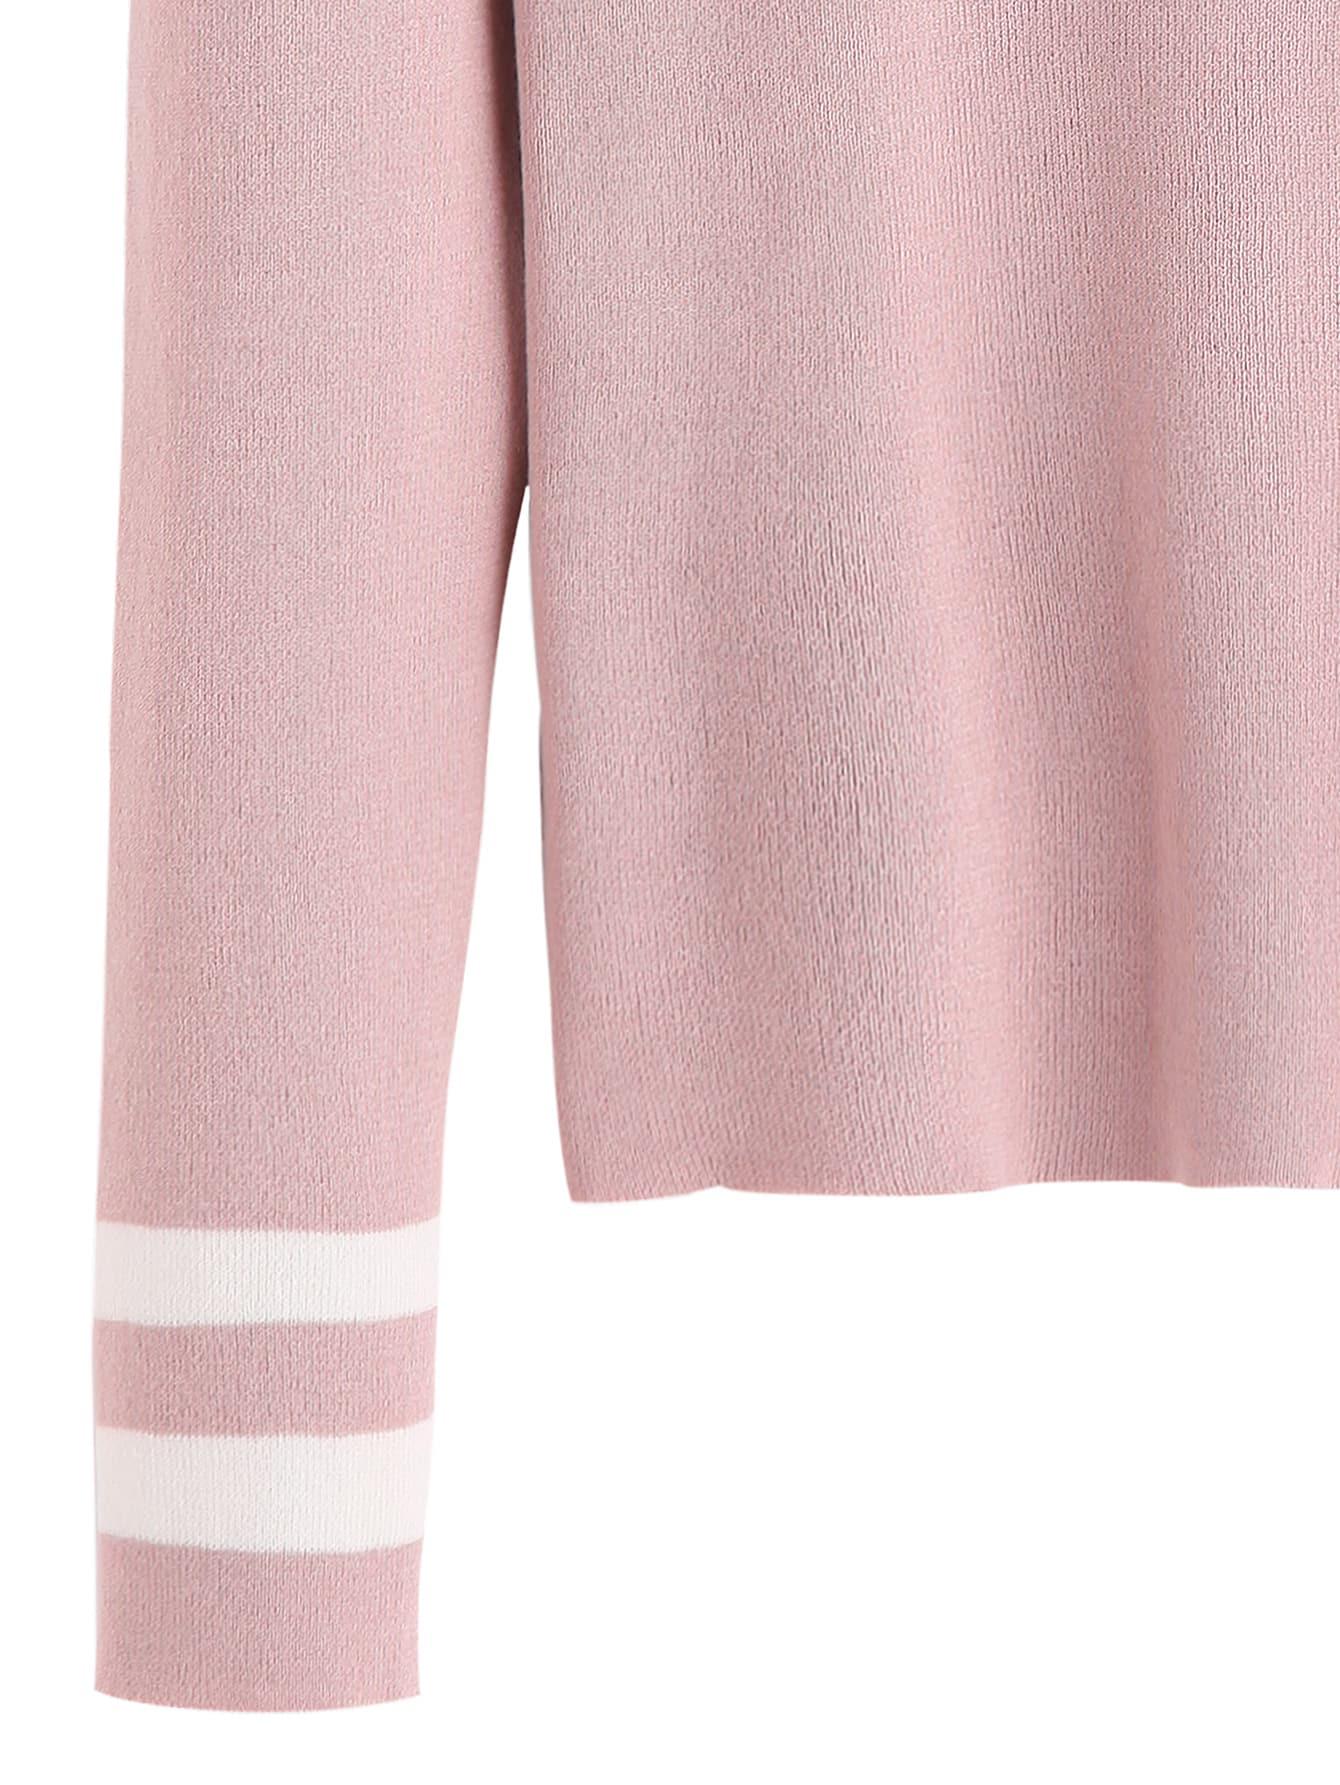 sweater160826021_2